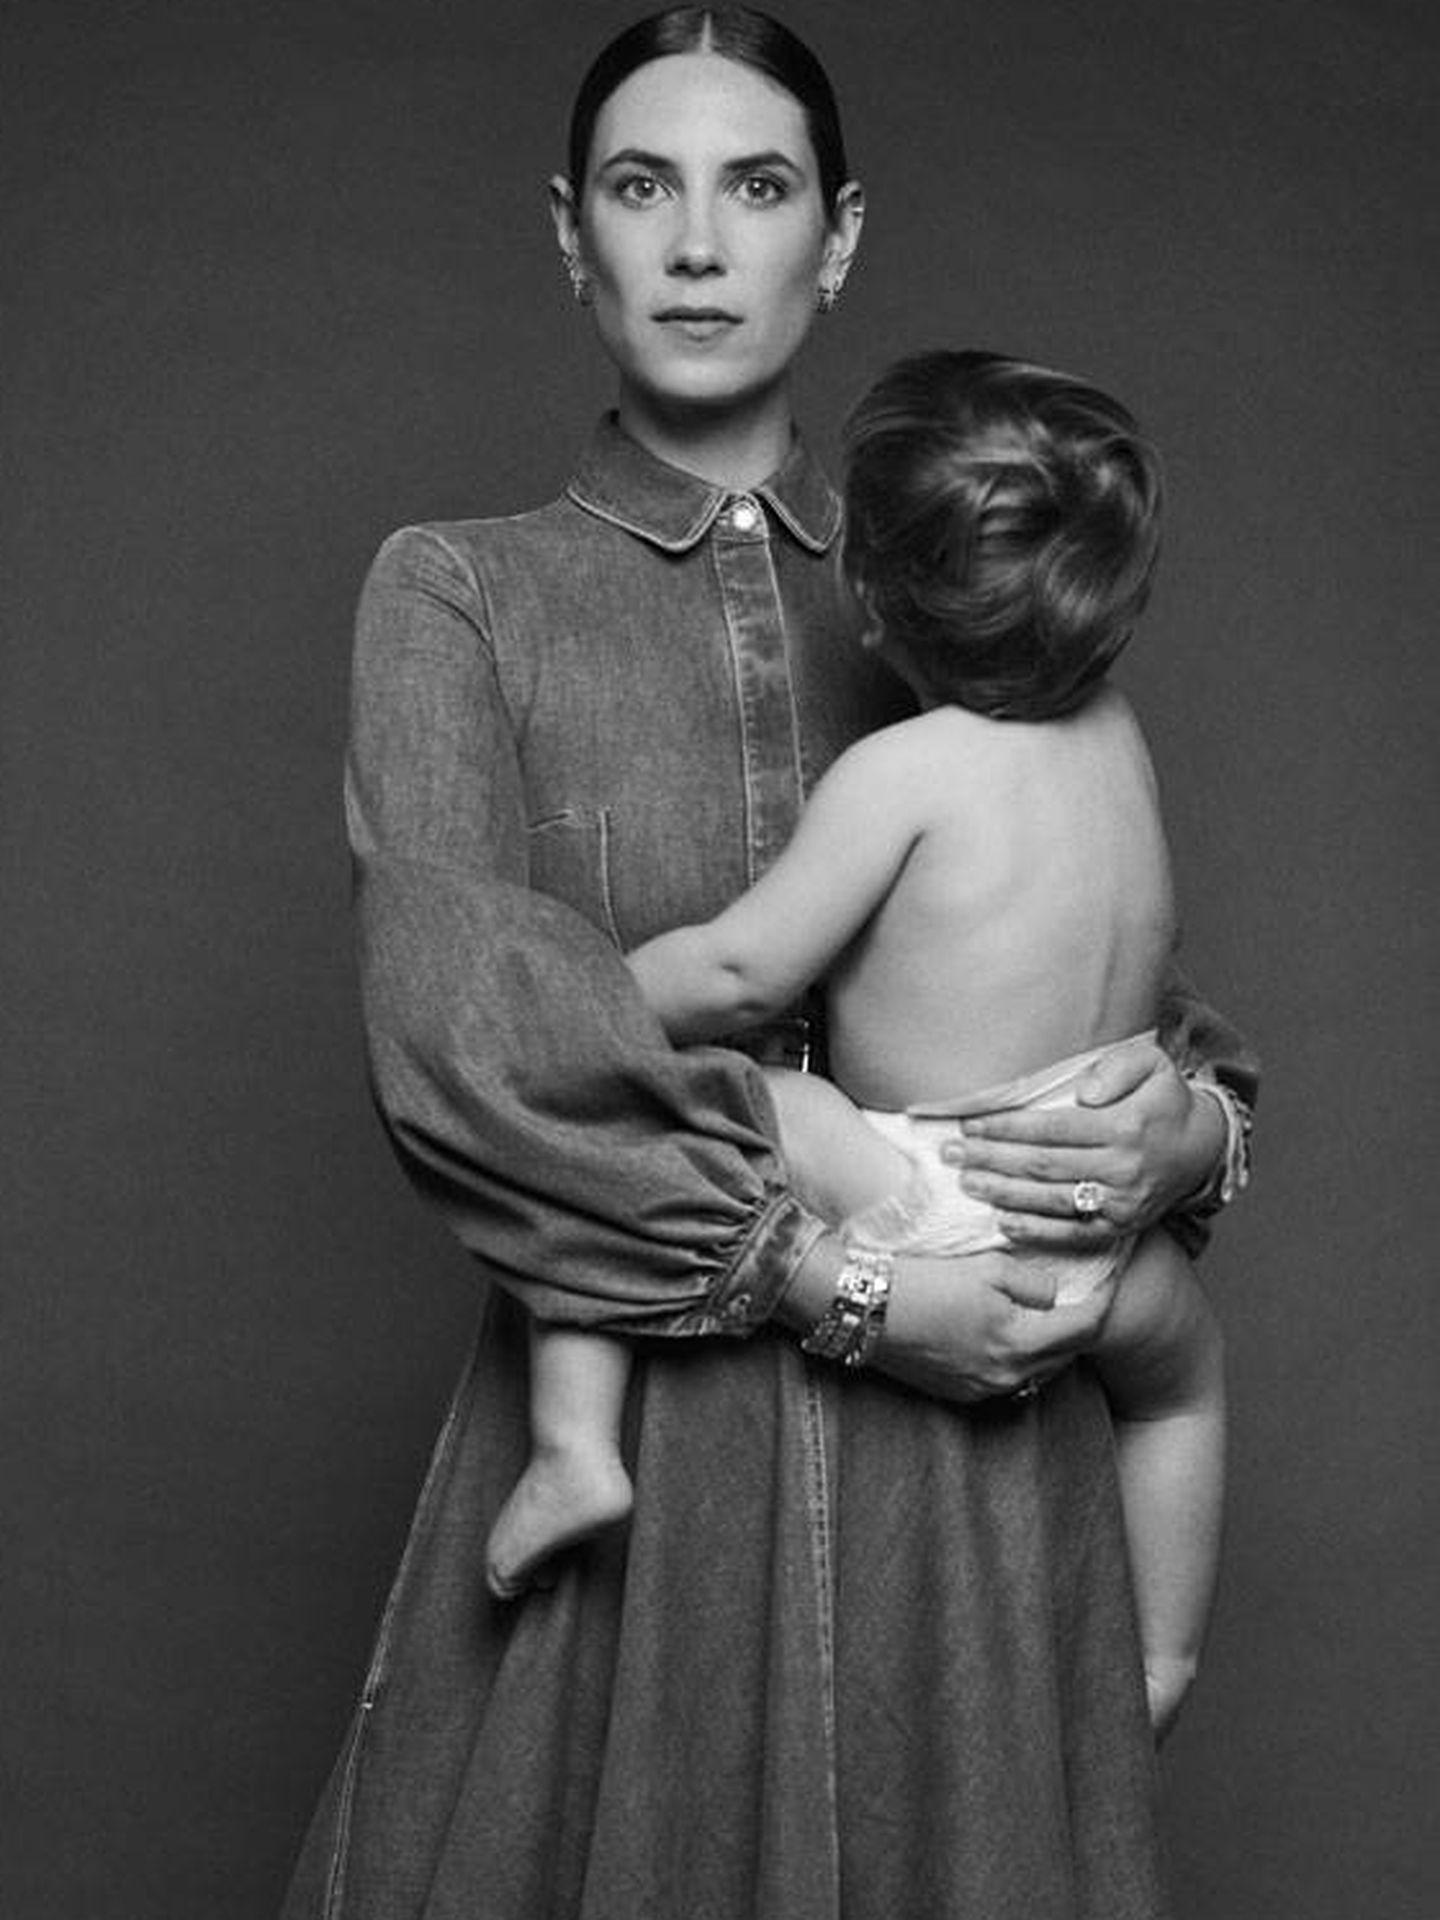 Tatiana Santo Domingo y su hijo Maximilian. (Emilia Wickstead)